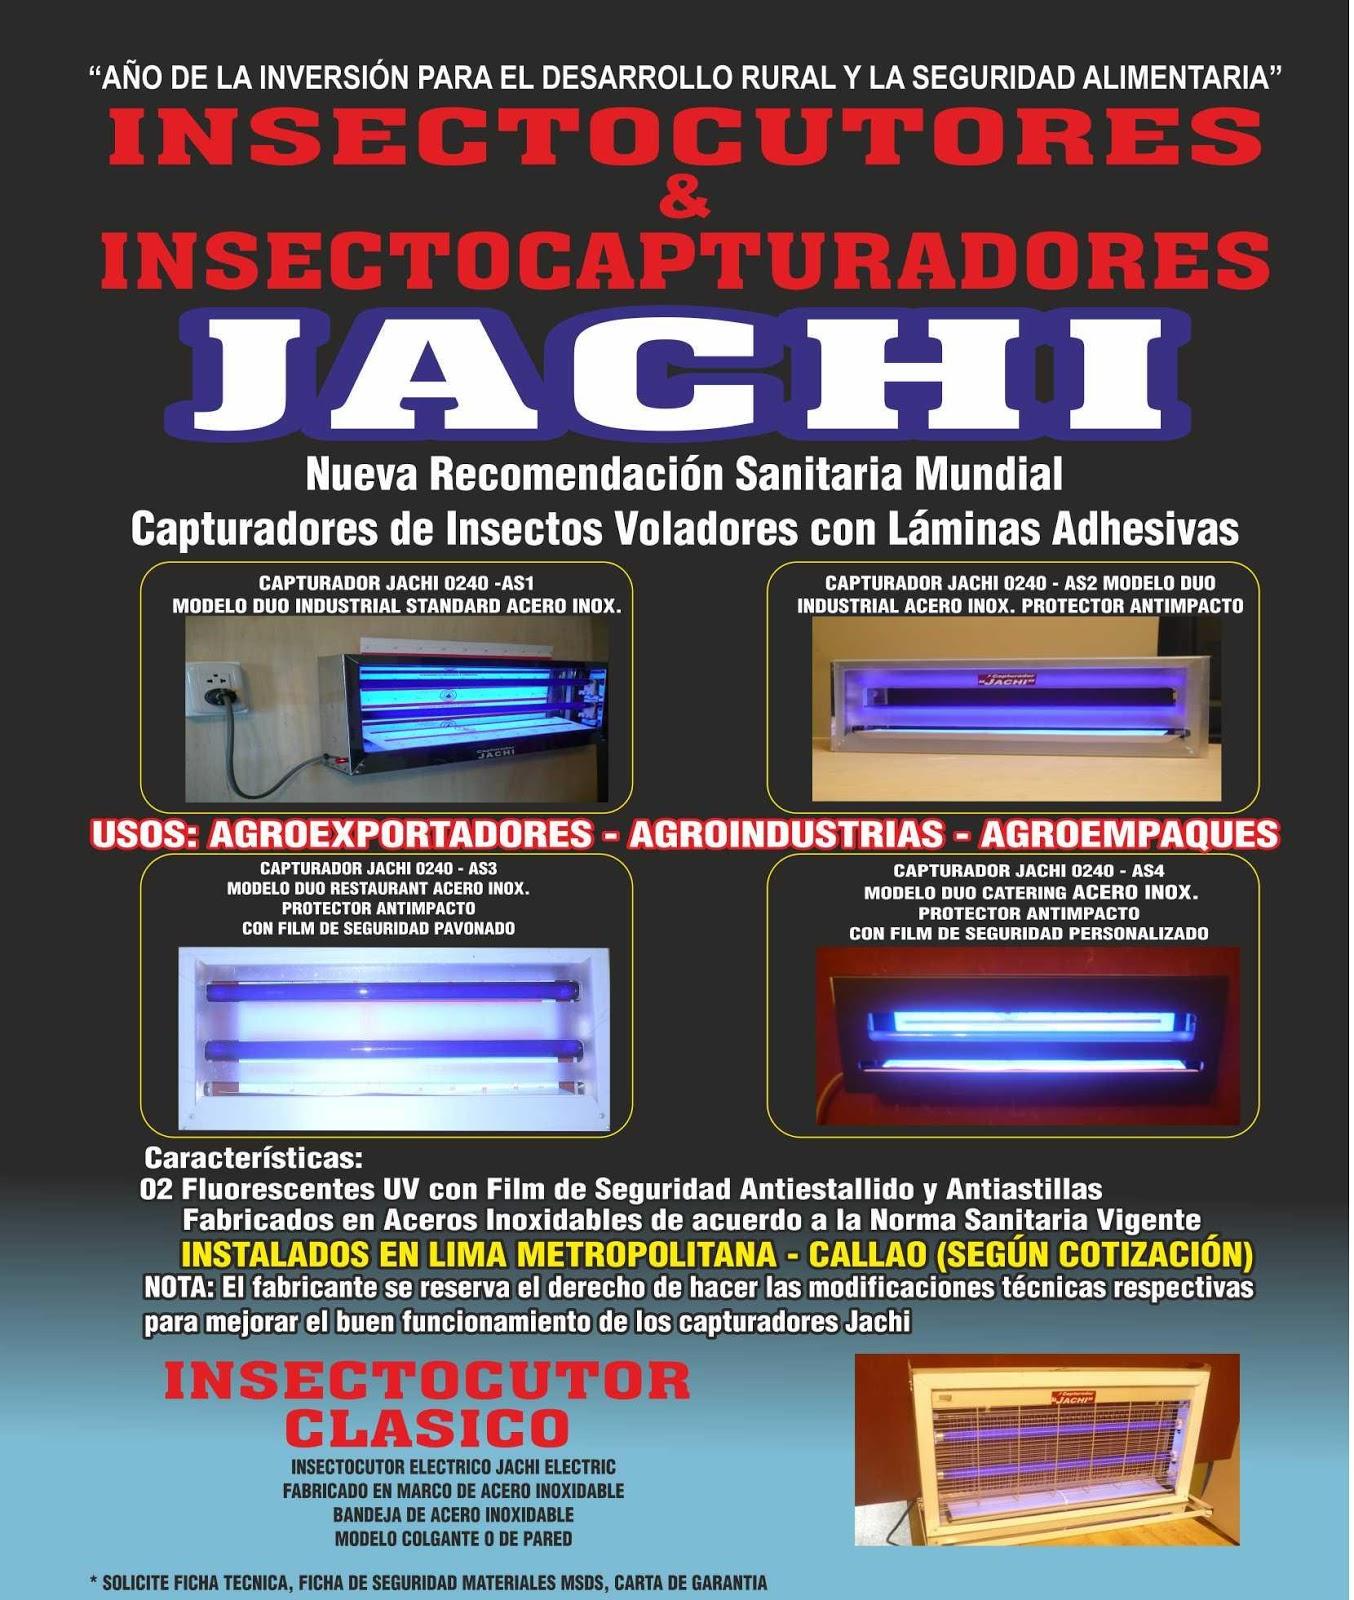 Insectocutor-Haccp: INSECTOCUTORES & INSECTOCAPTURADORES JACHI